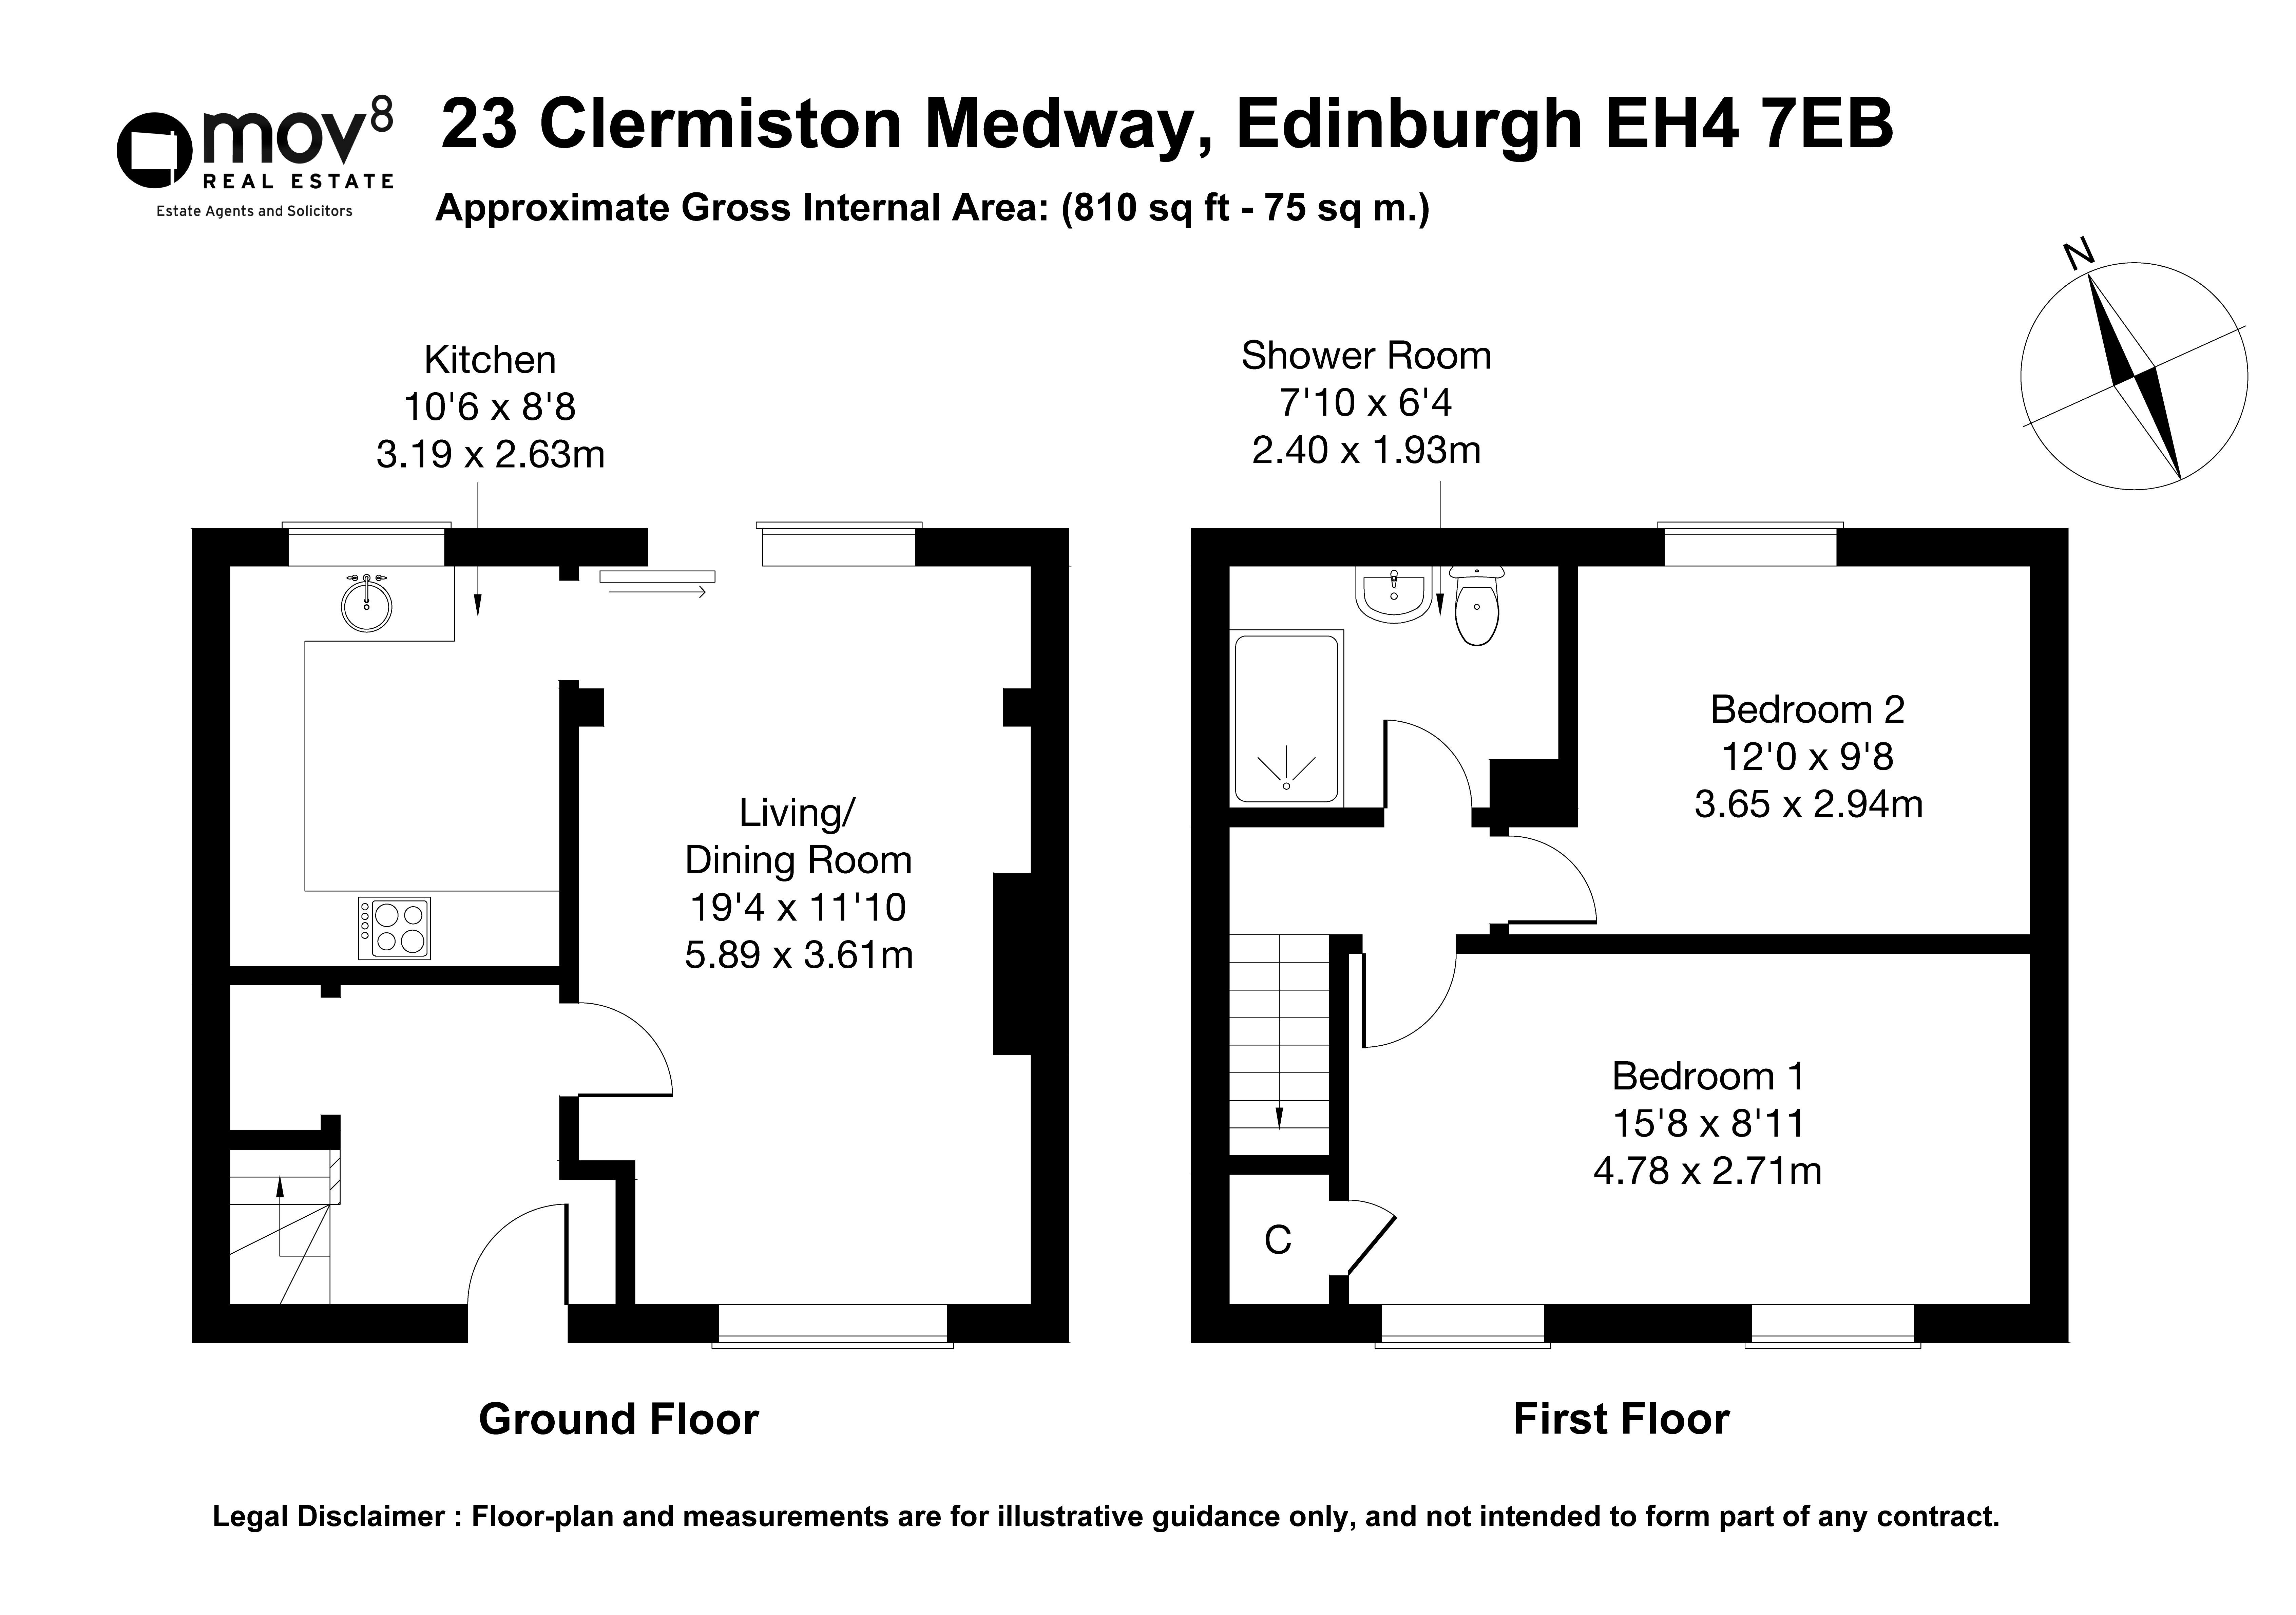 Floorplan 1 of 23 Clermiston Medway, Clermiston, Edinburgh, EH4 7EB